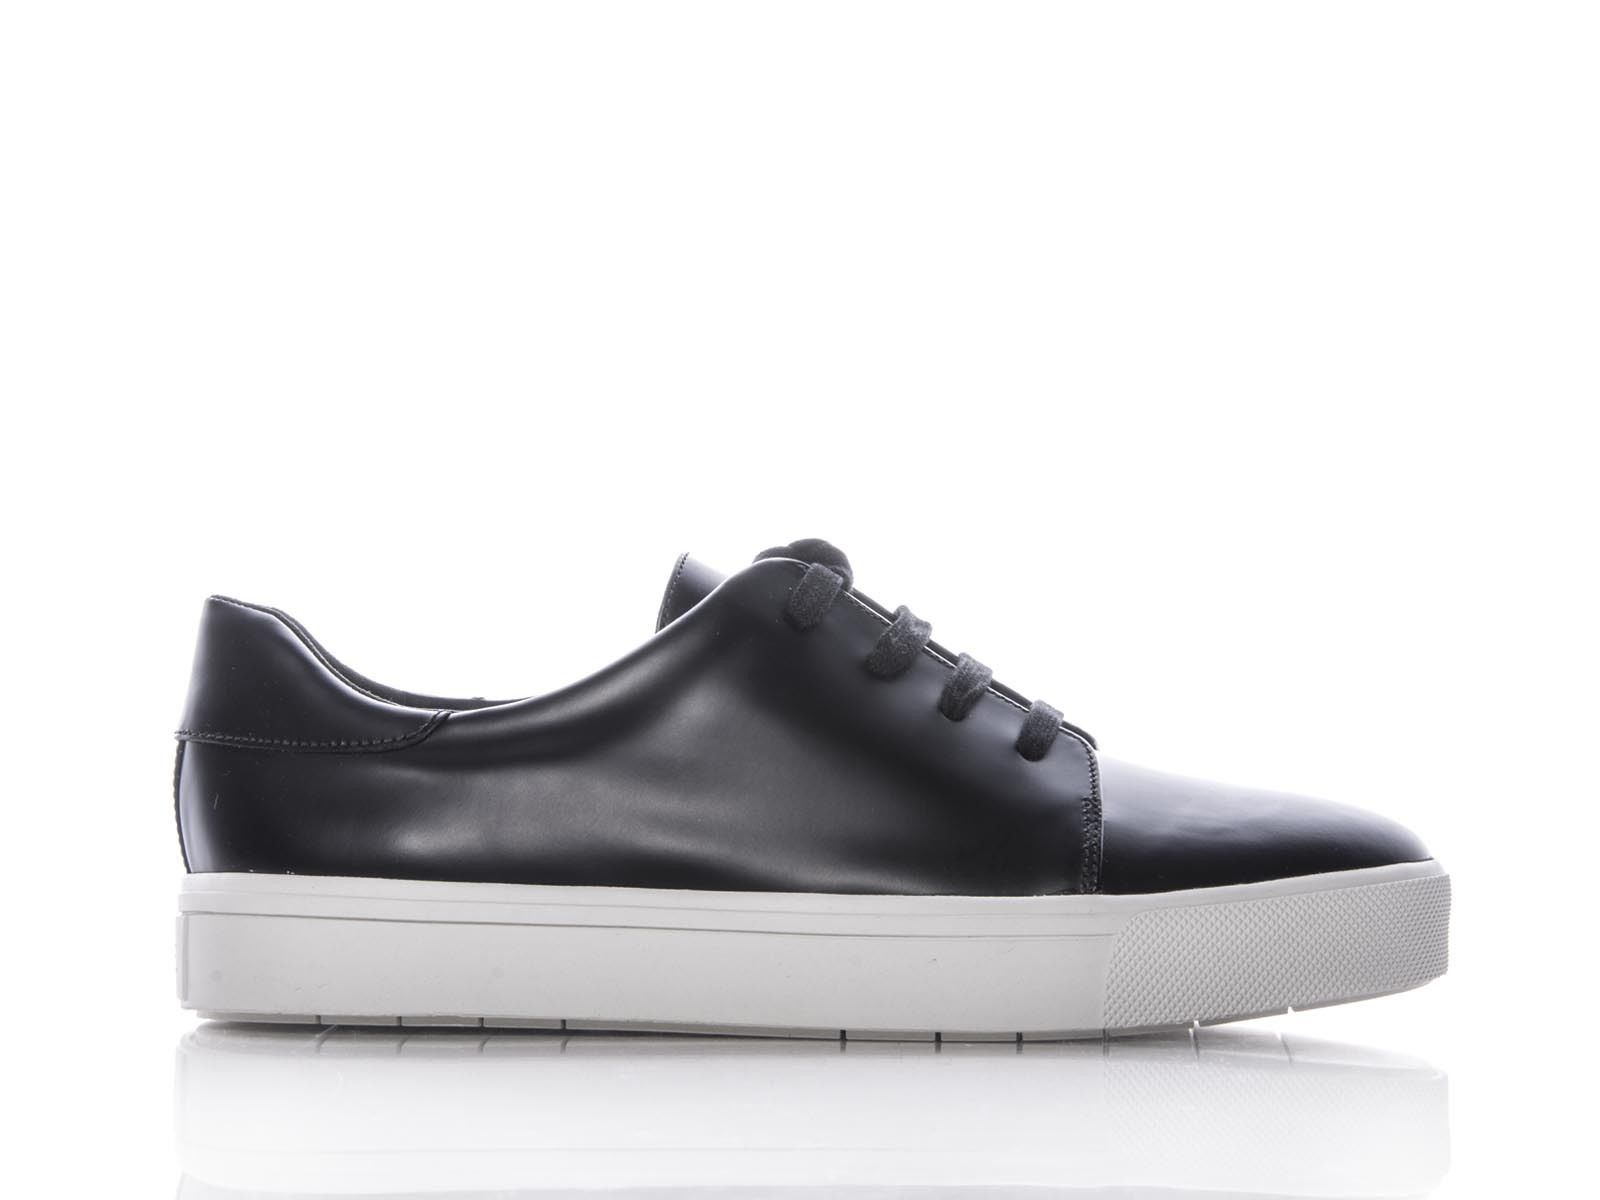 Vince. Bale Sneakers Size 9 Black - $98.01